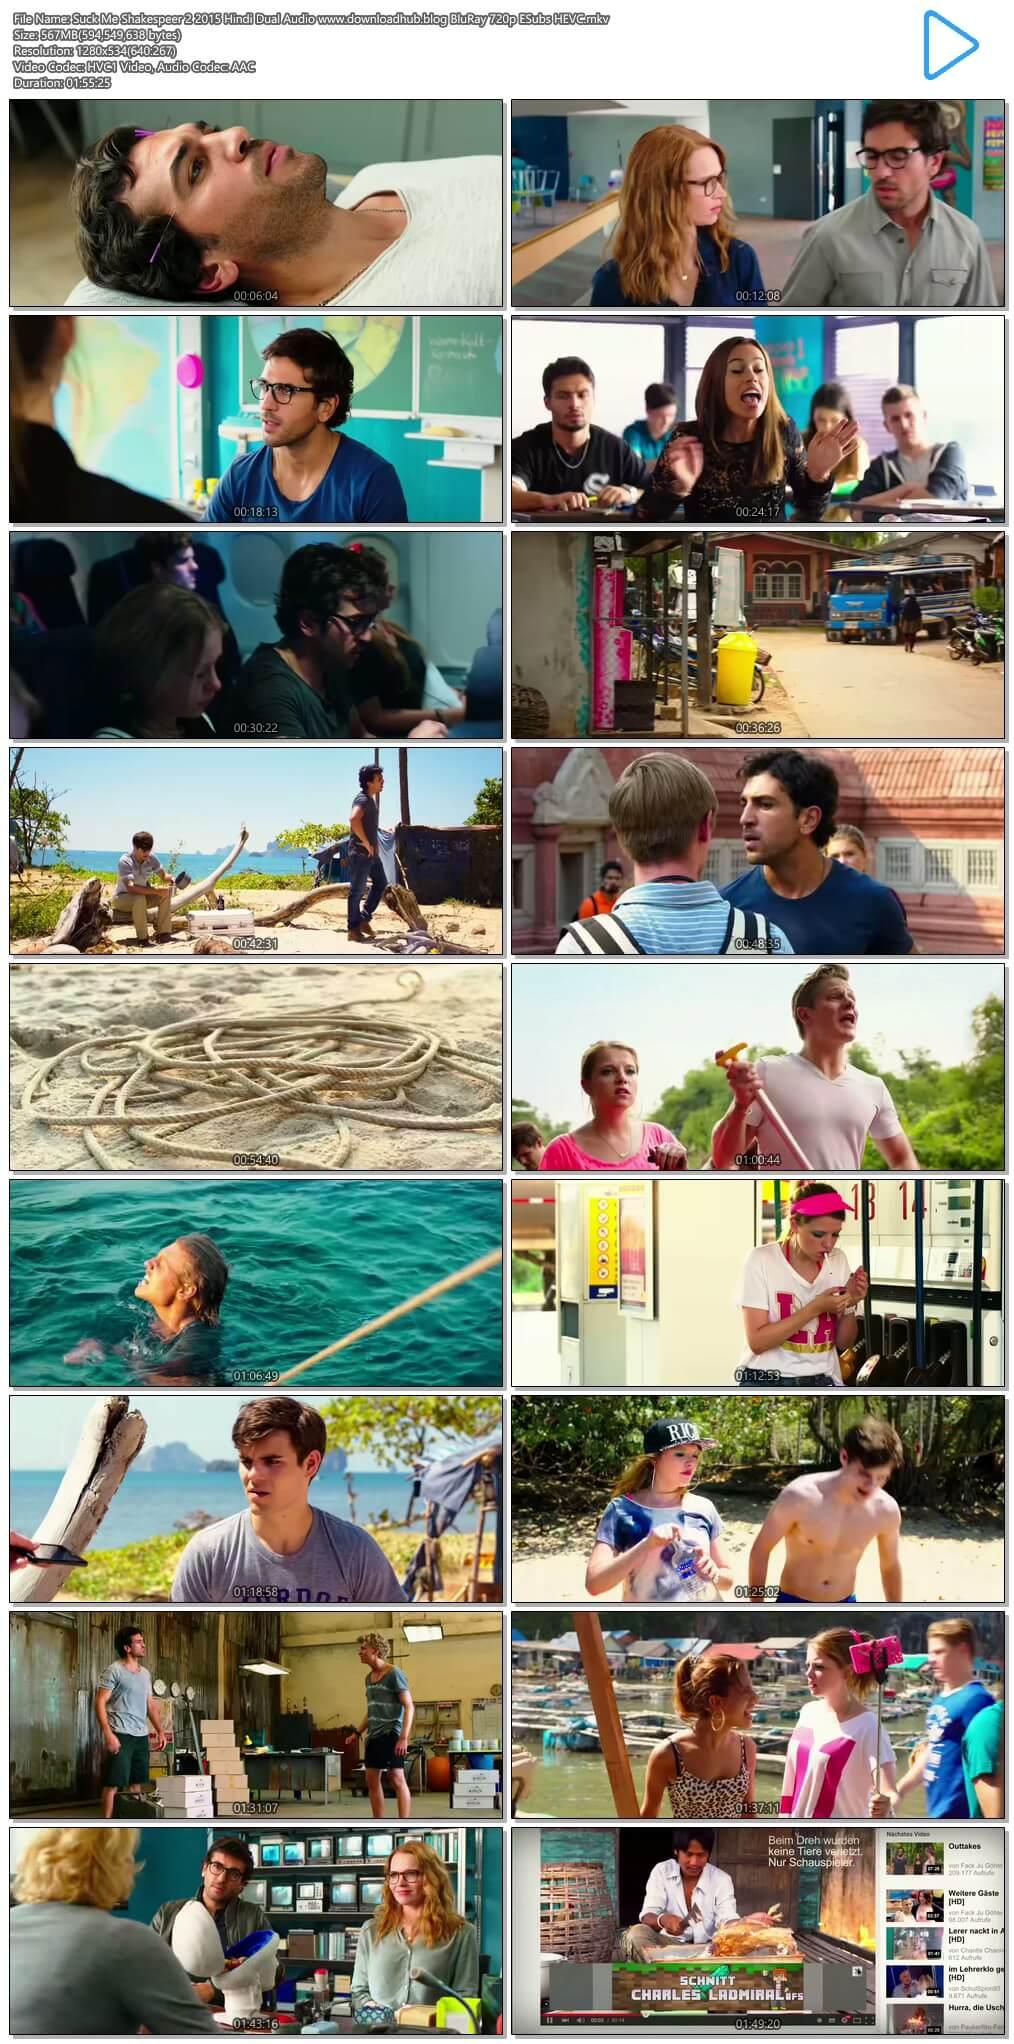 Suck Me Shakespeer 2 2015 Hindi Dual Audio 550MB BluRay 720p ESubs HEVC